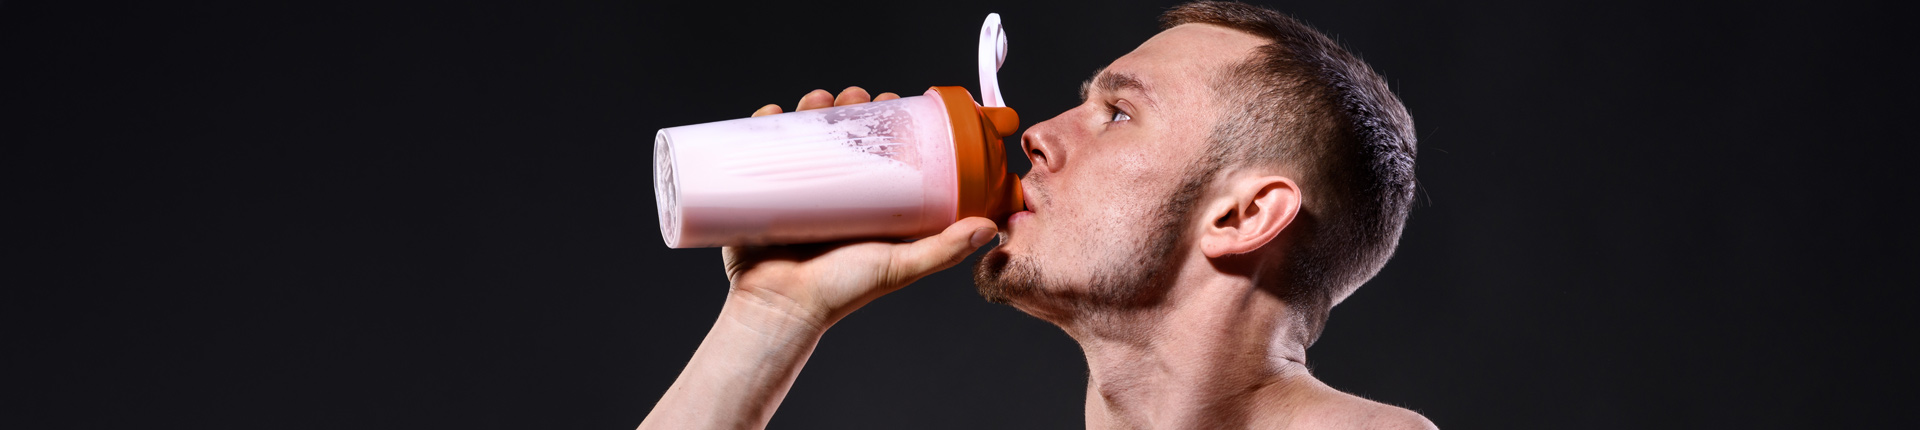 Koncentrat białka Olimp, SFD, ALLNUTRITION i inne